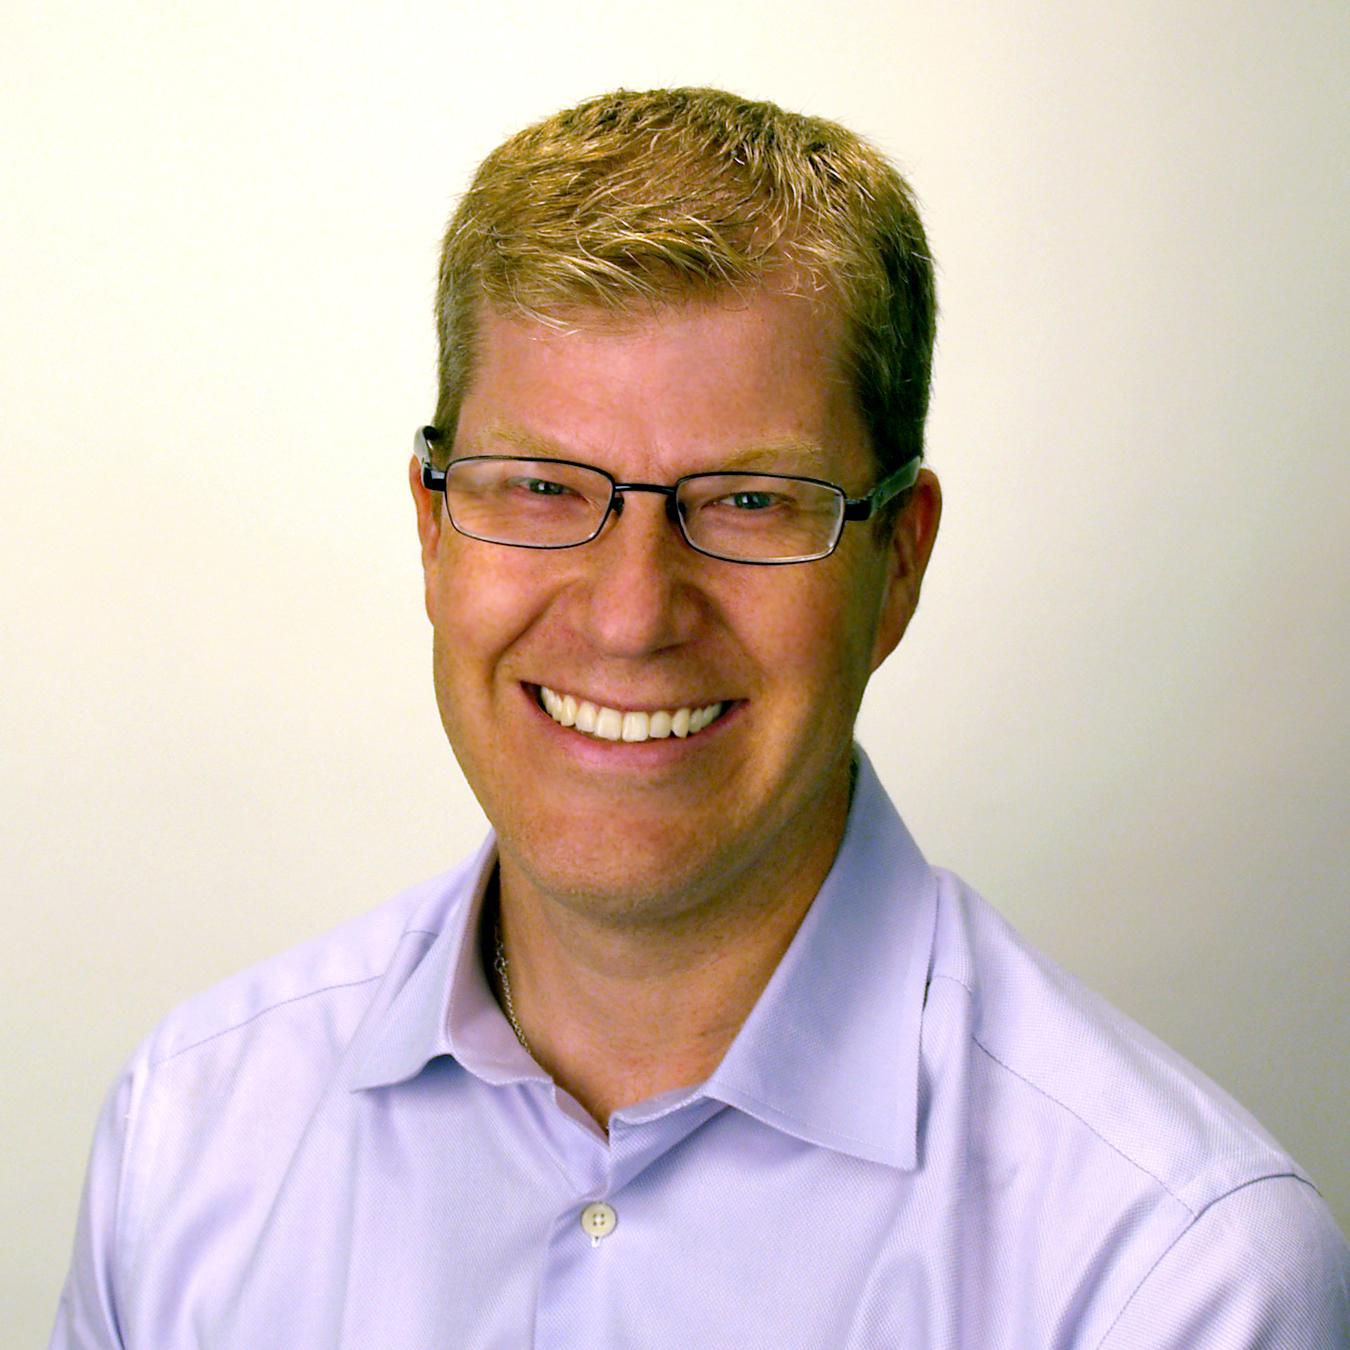 Aaron Fyke, Thin Line Capital